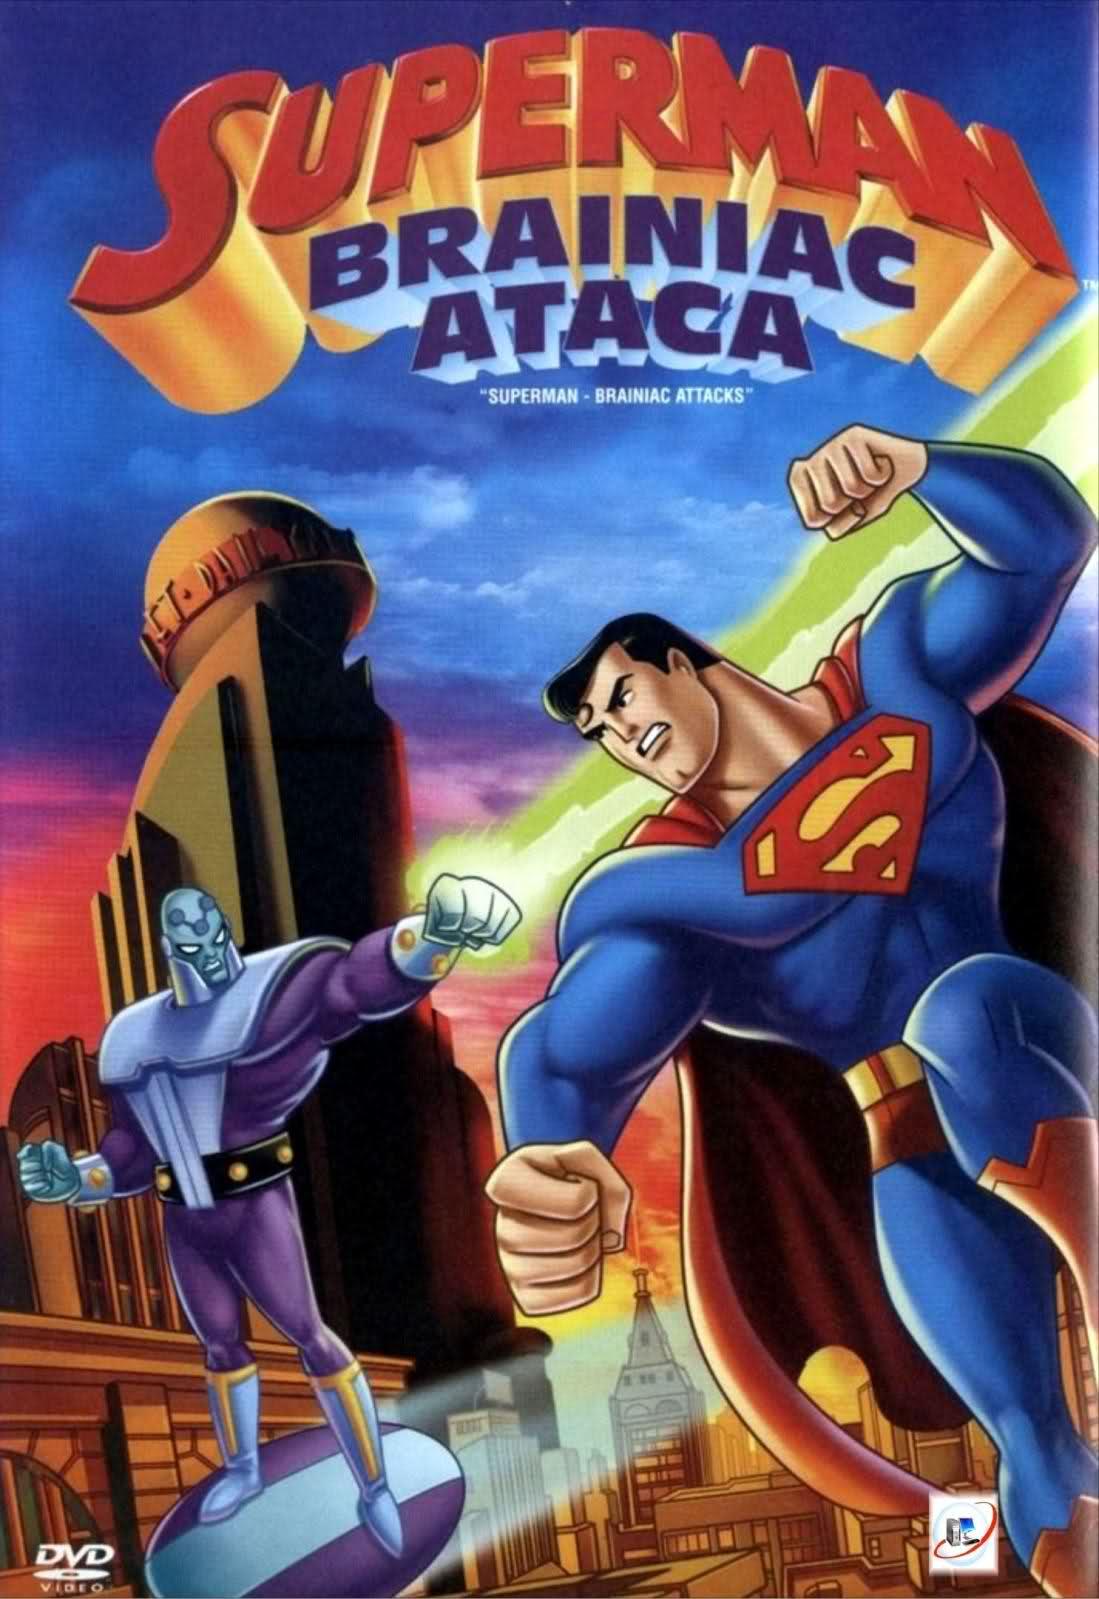 Superman: Brainiac Ataca - HD 720p